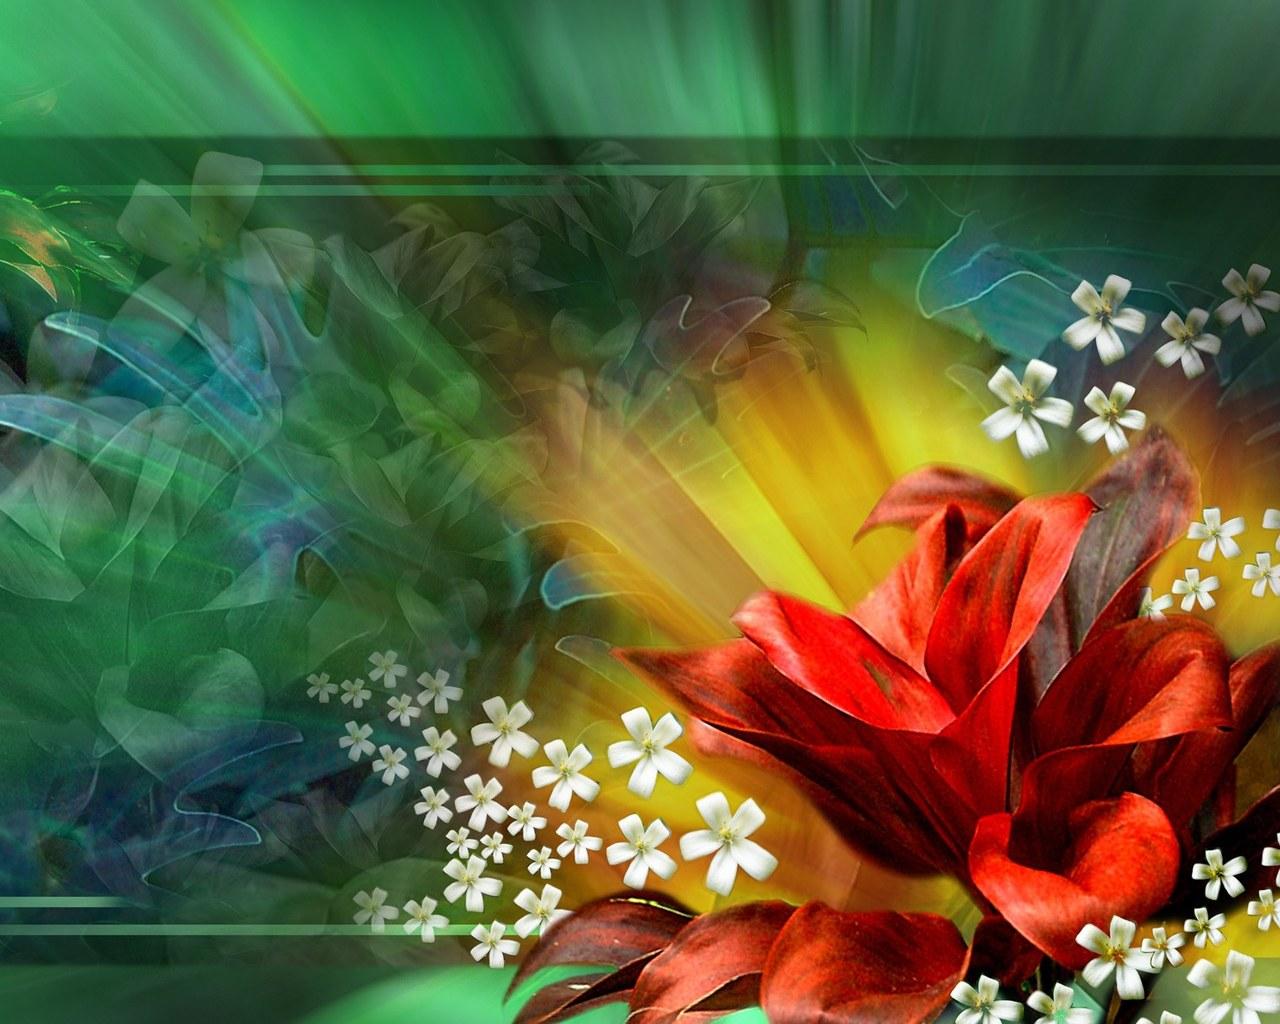 Backgrounds Wallpaper PC 3D Graphics Cherry 3d wallpaper 1280x1024